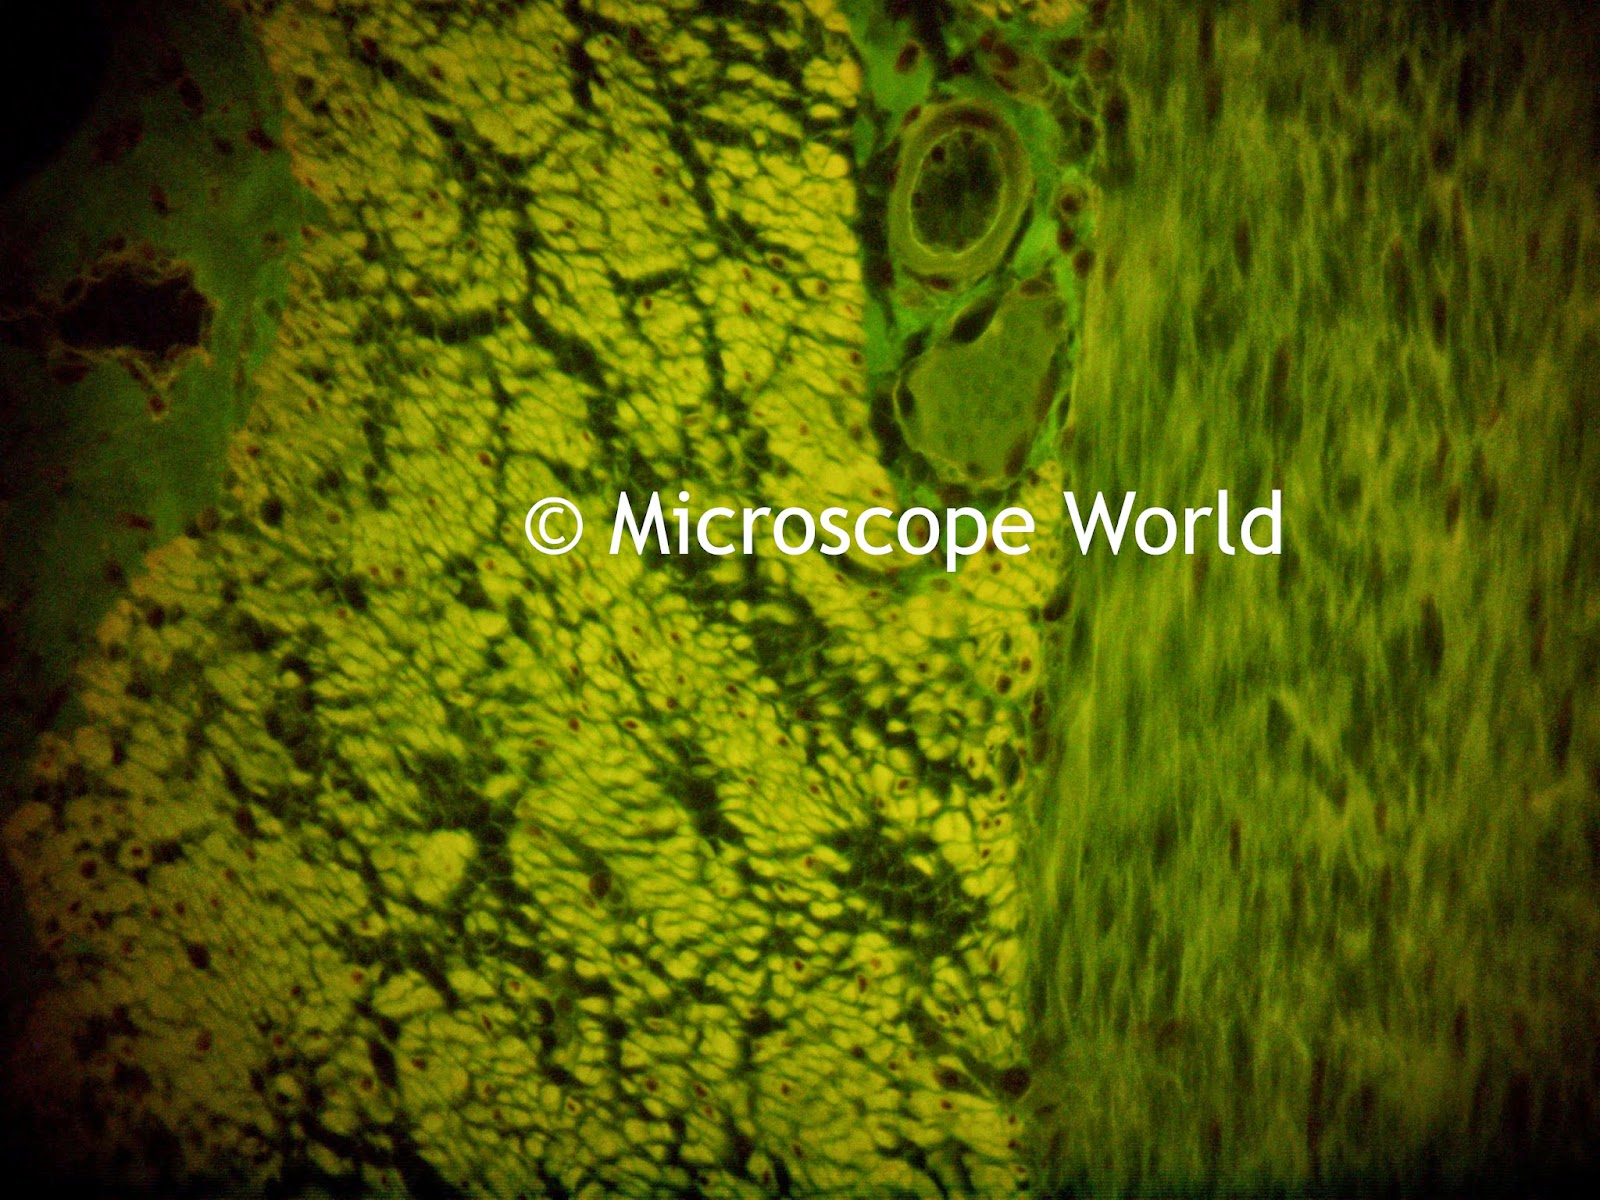 fluorescence microscopy 400x image